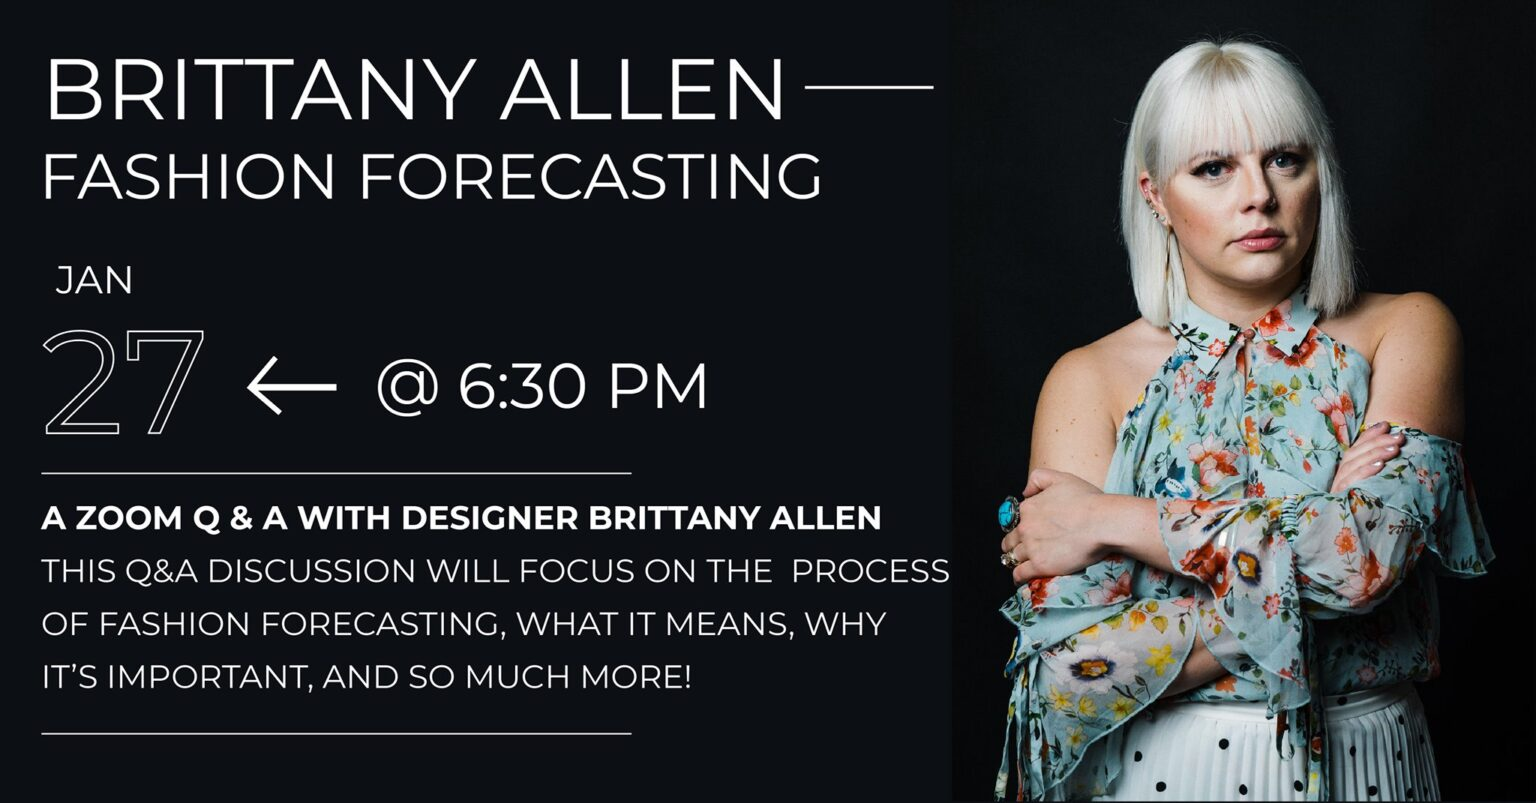 Brittany Allen - Fashion Forecasting